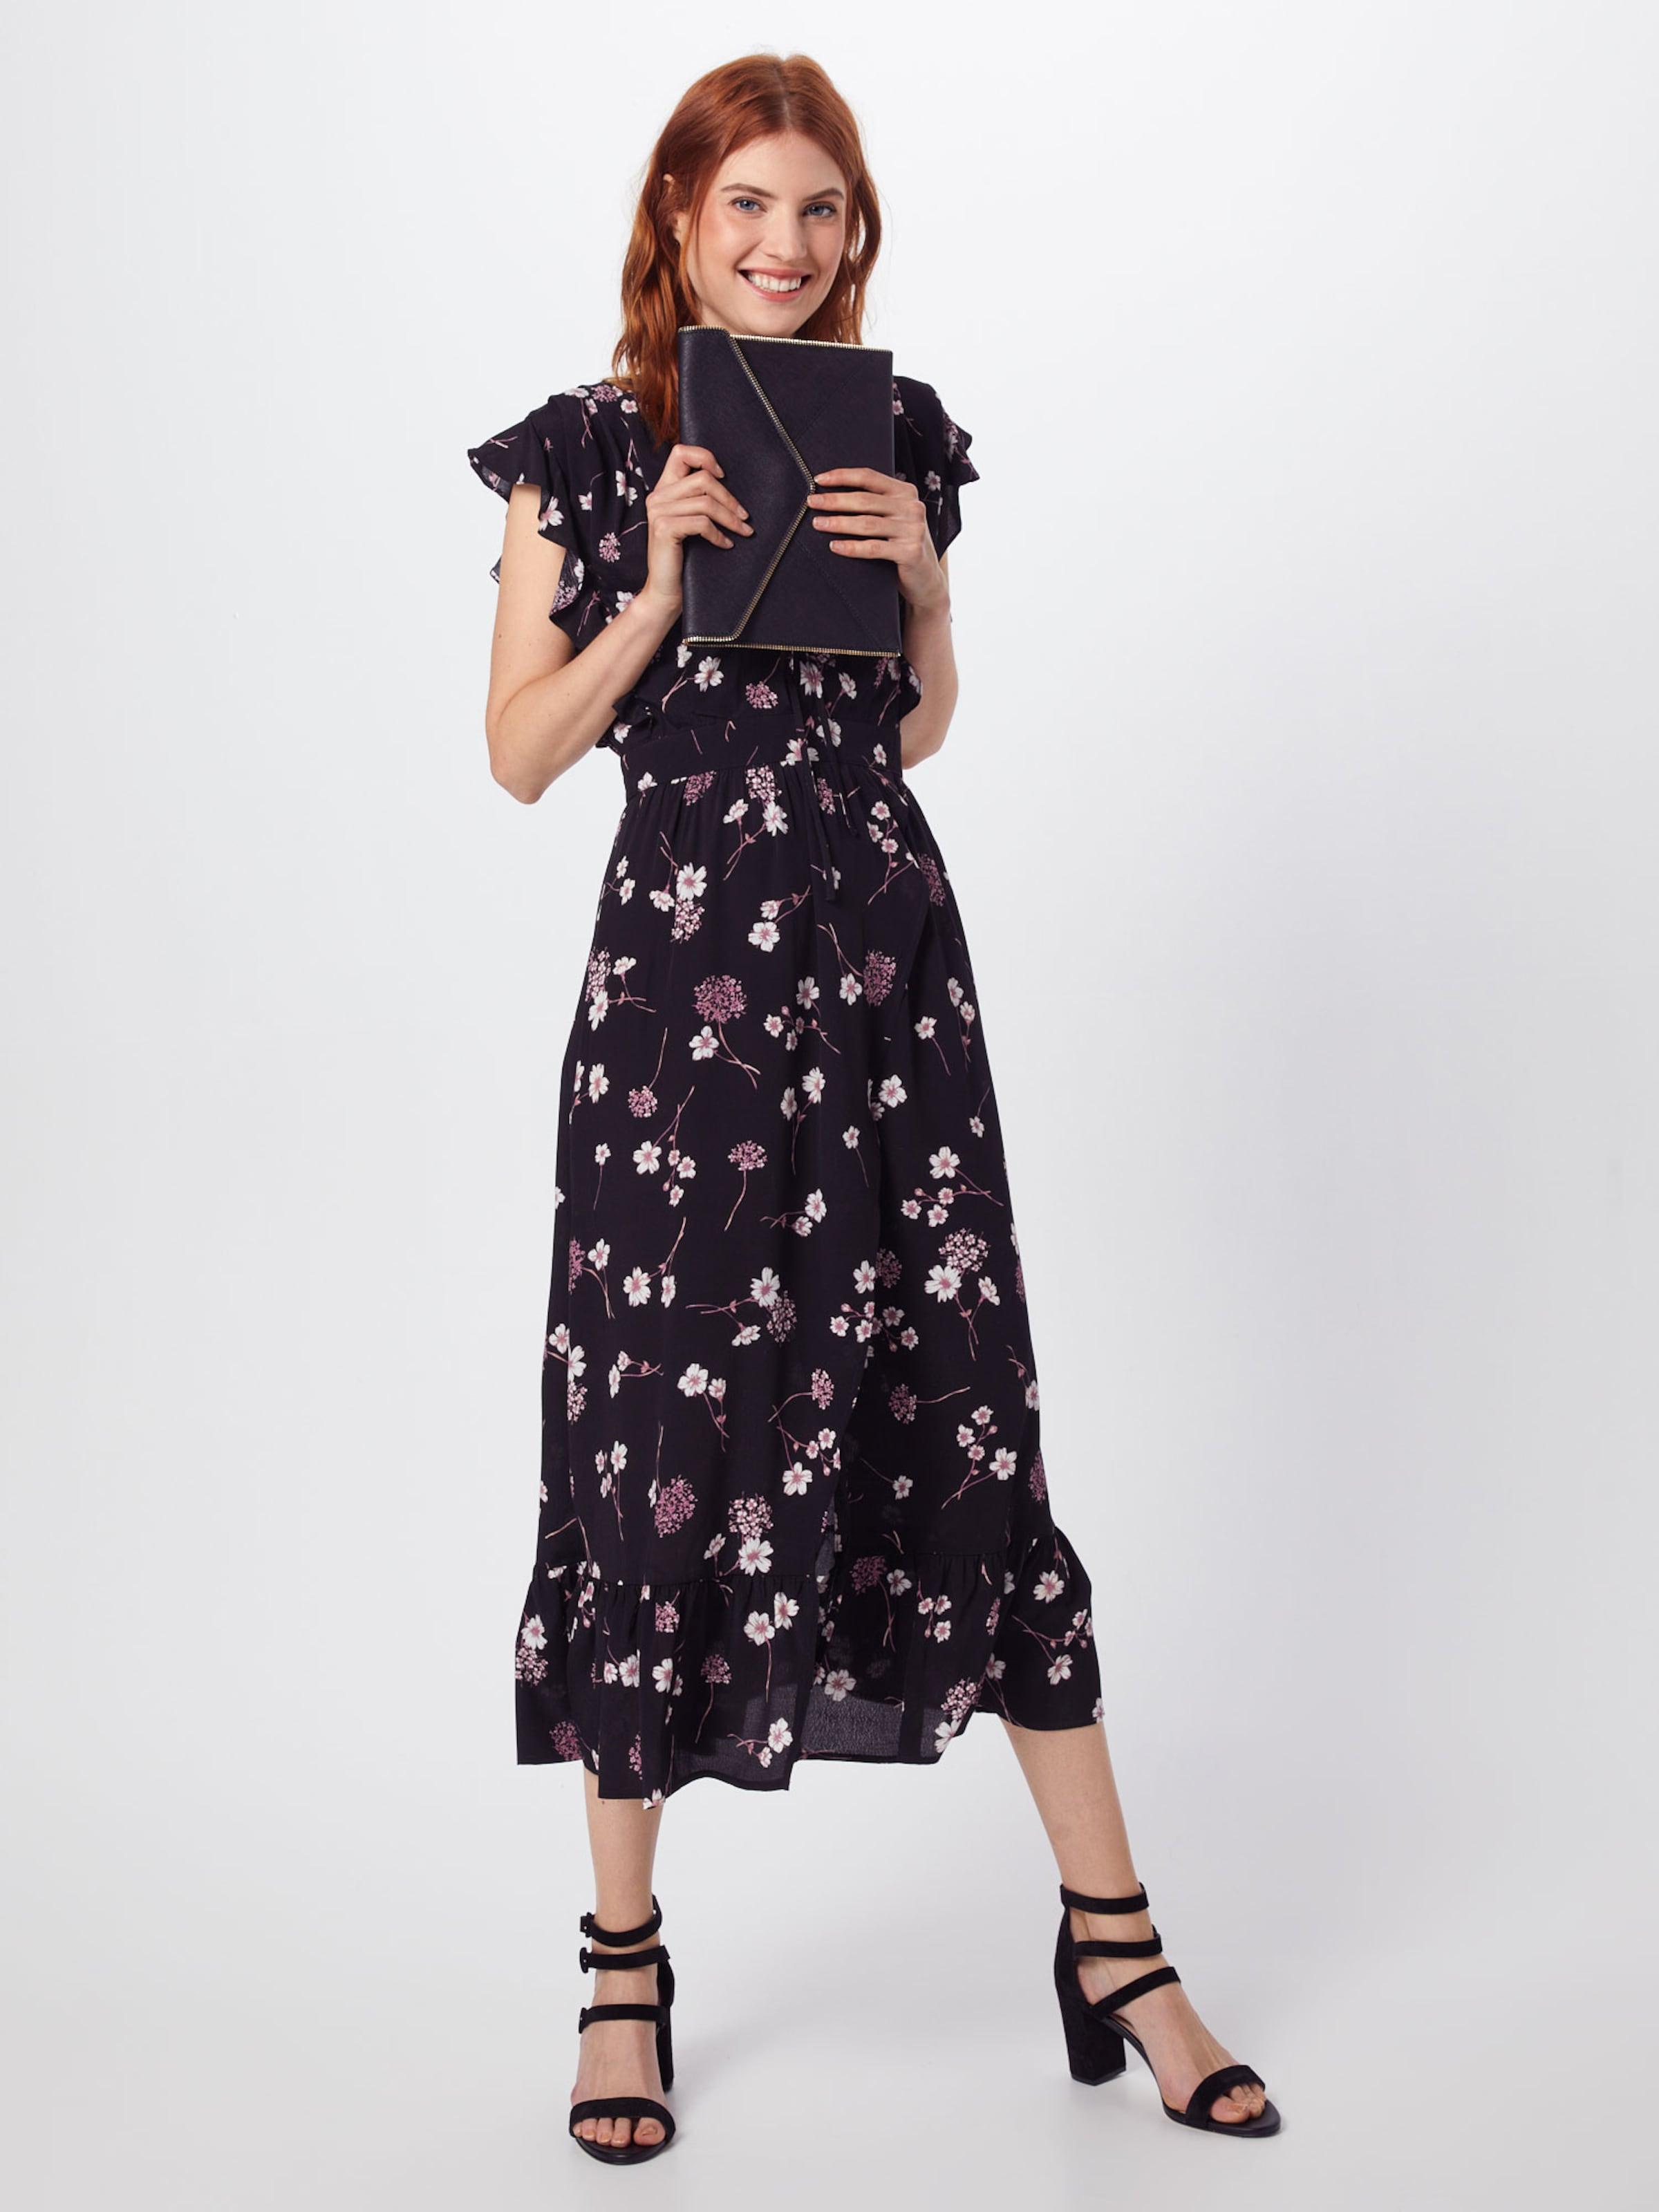 'night Blanc Minkpink VioletNoir Robe Garden' En DHeW92YbEI